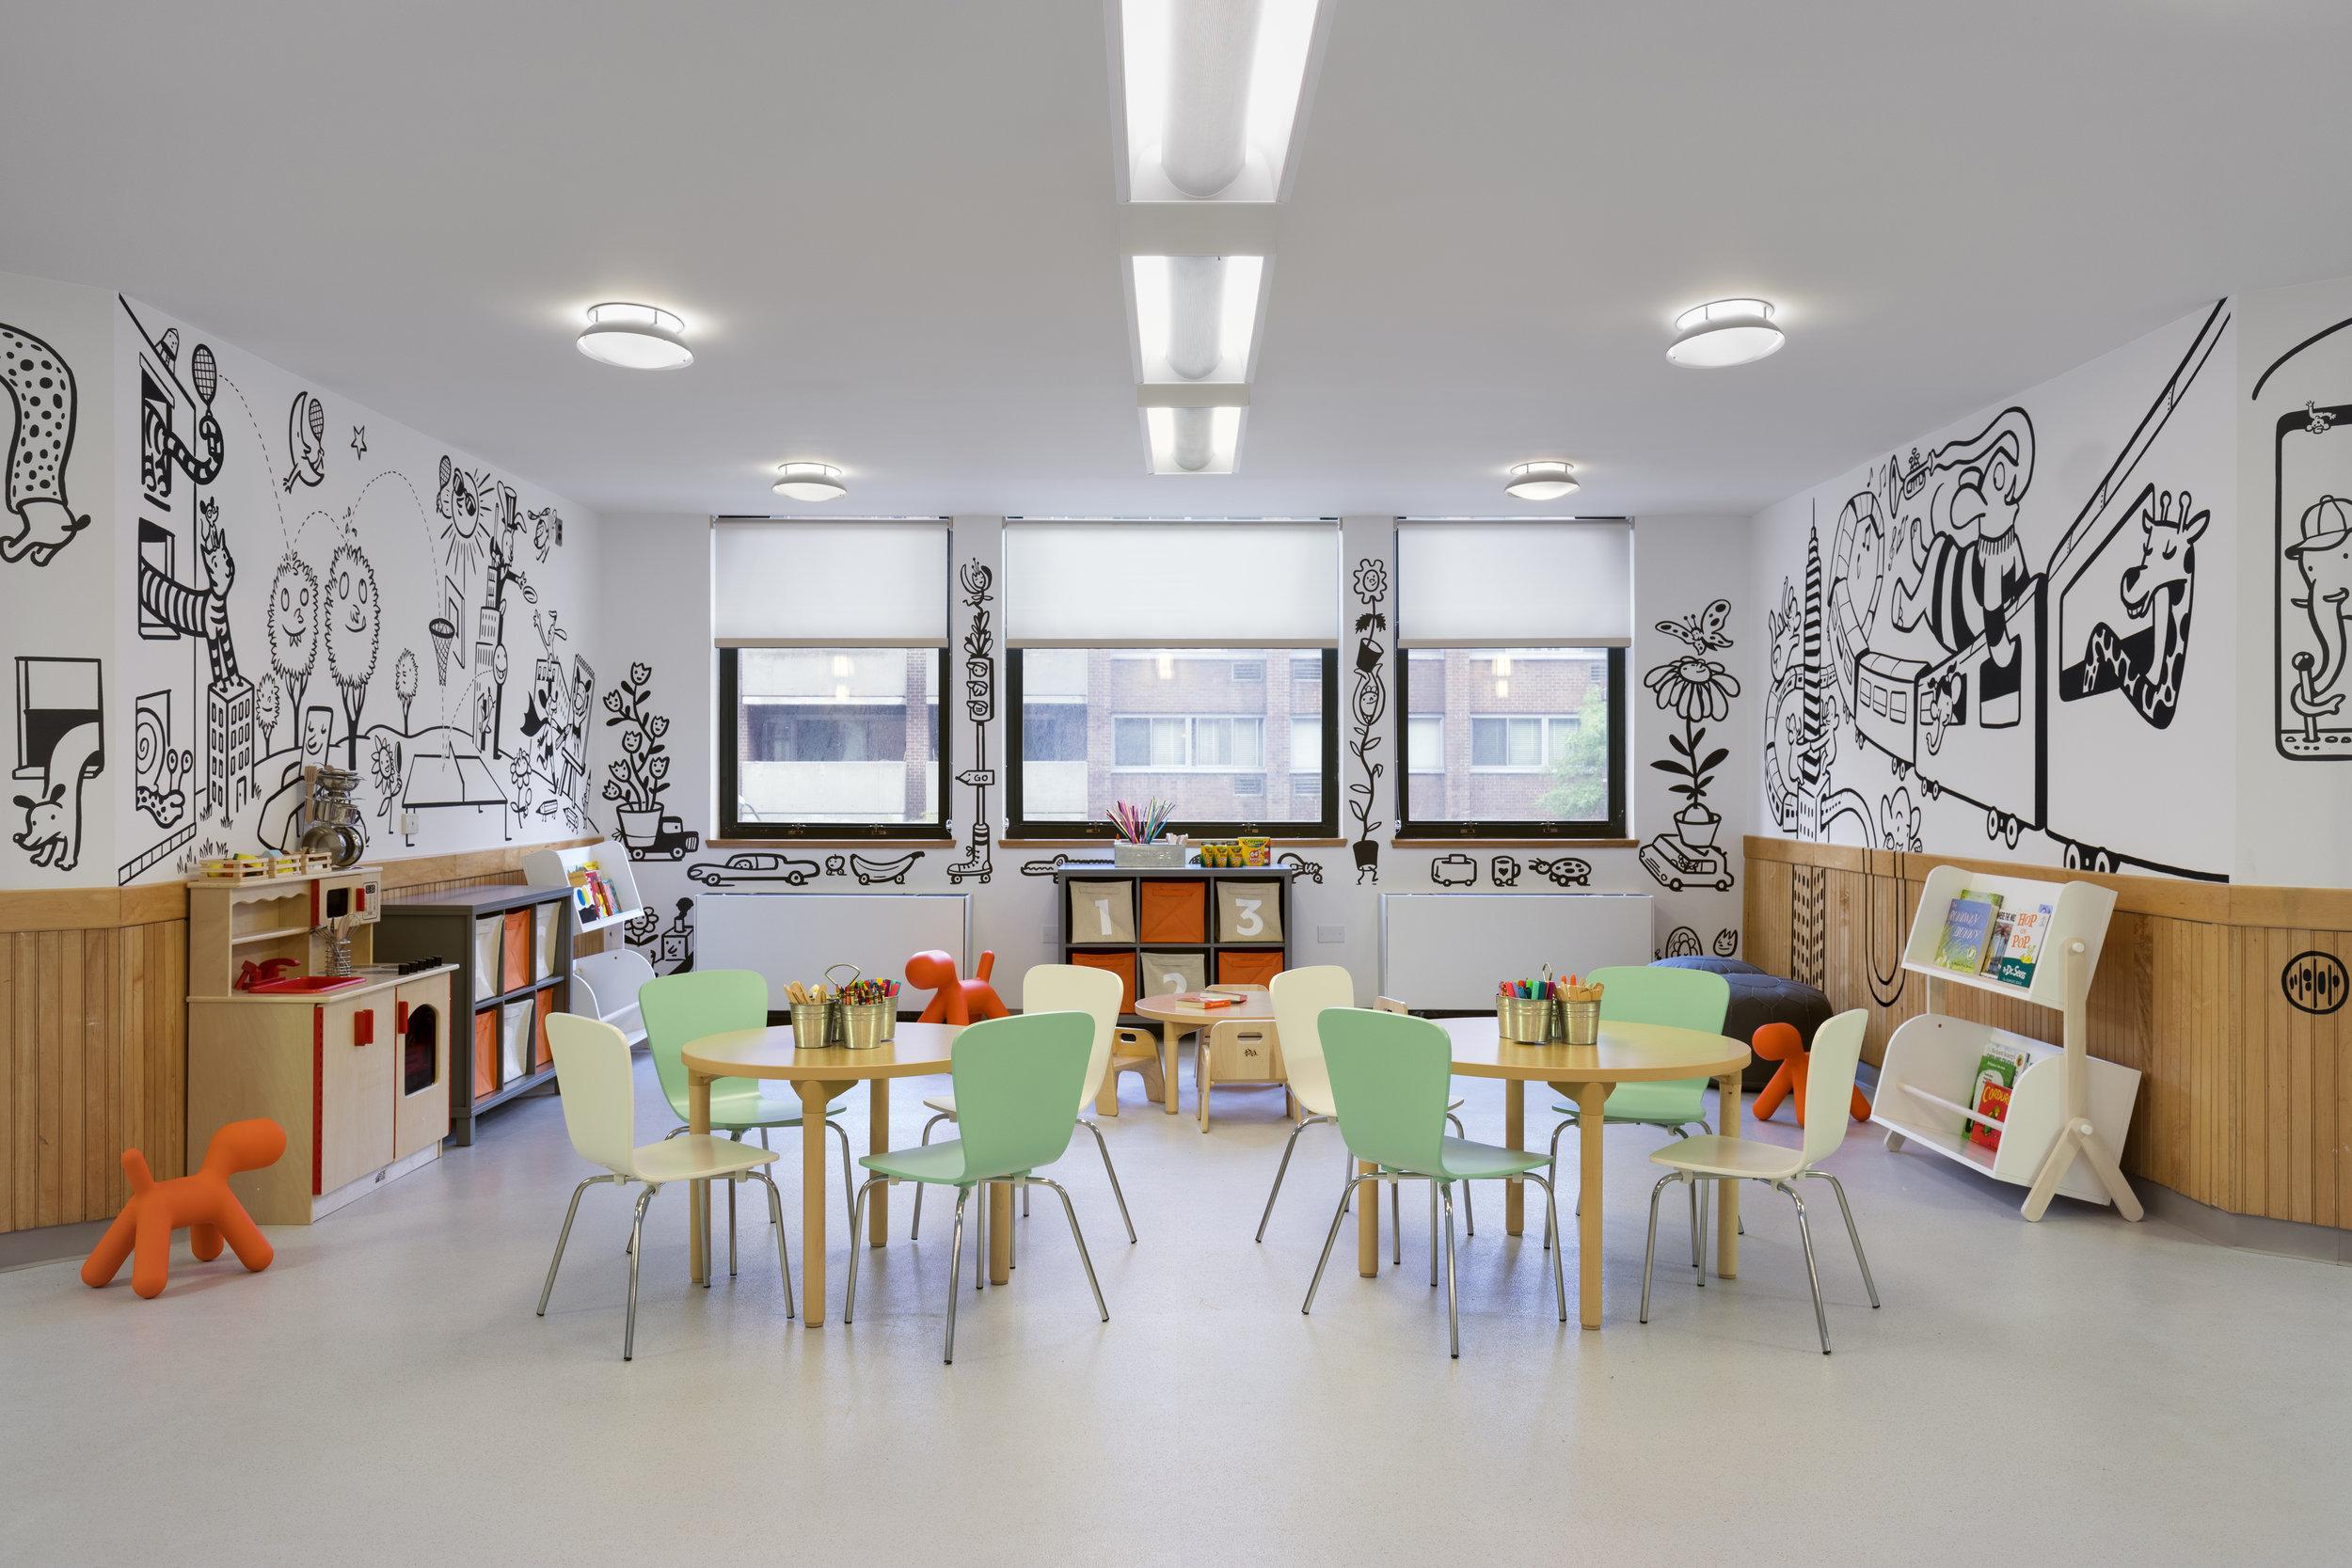 ACS.Nursery.Full view.jpg